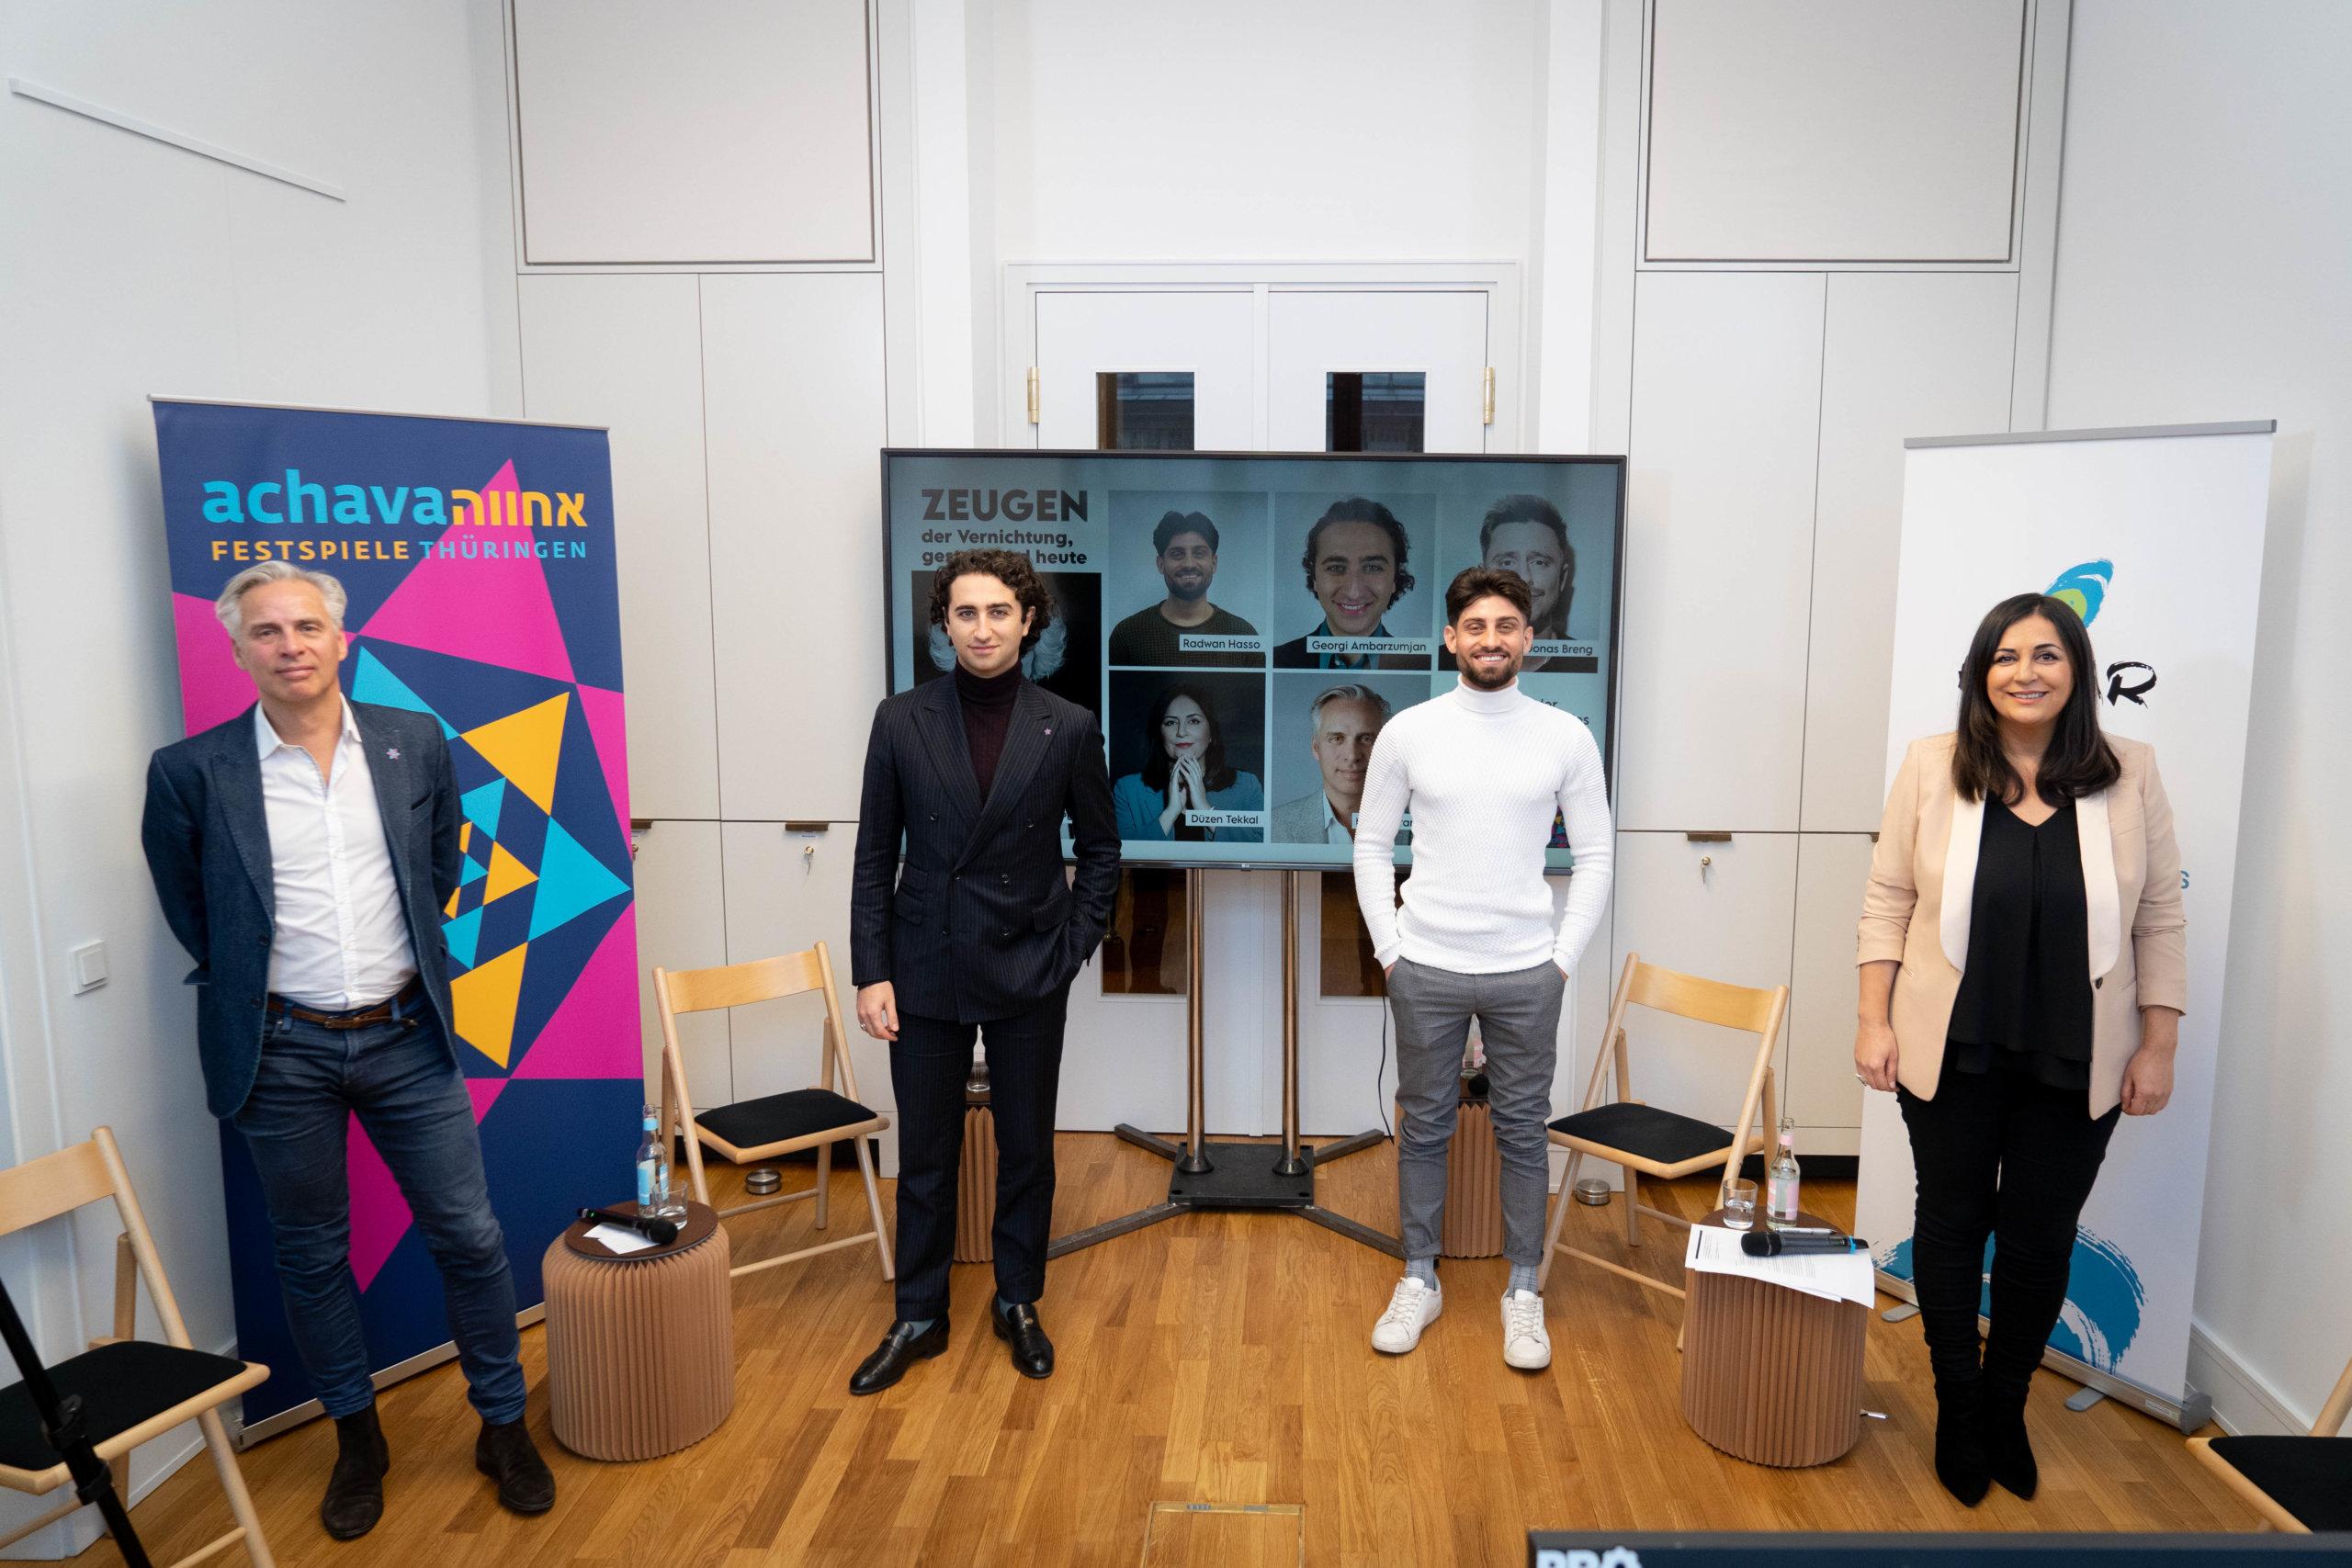 Martin Kranz, Georgi Ambarzumjan, Radwan Hasso & Düzen Tekkal